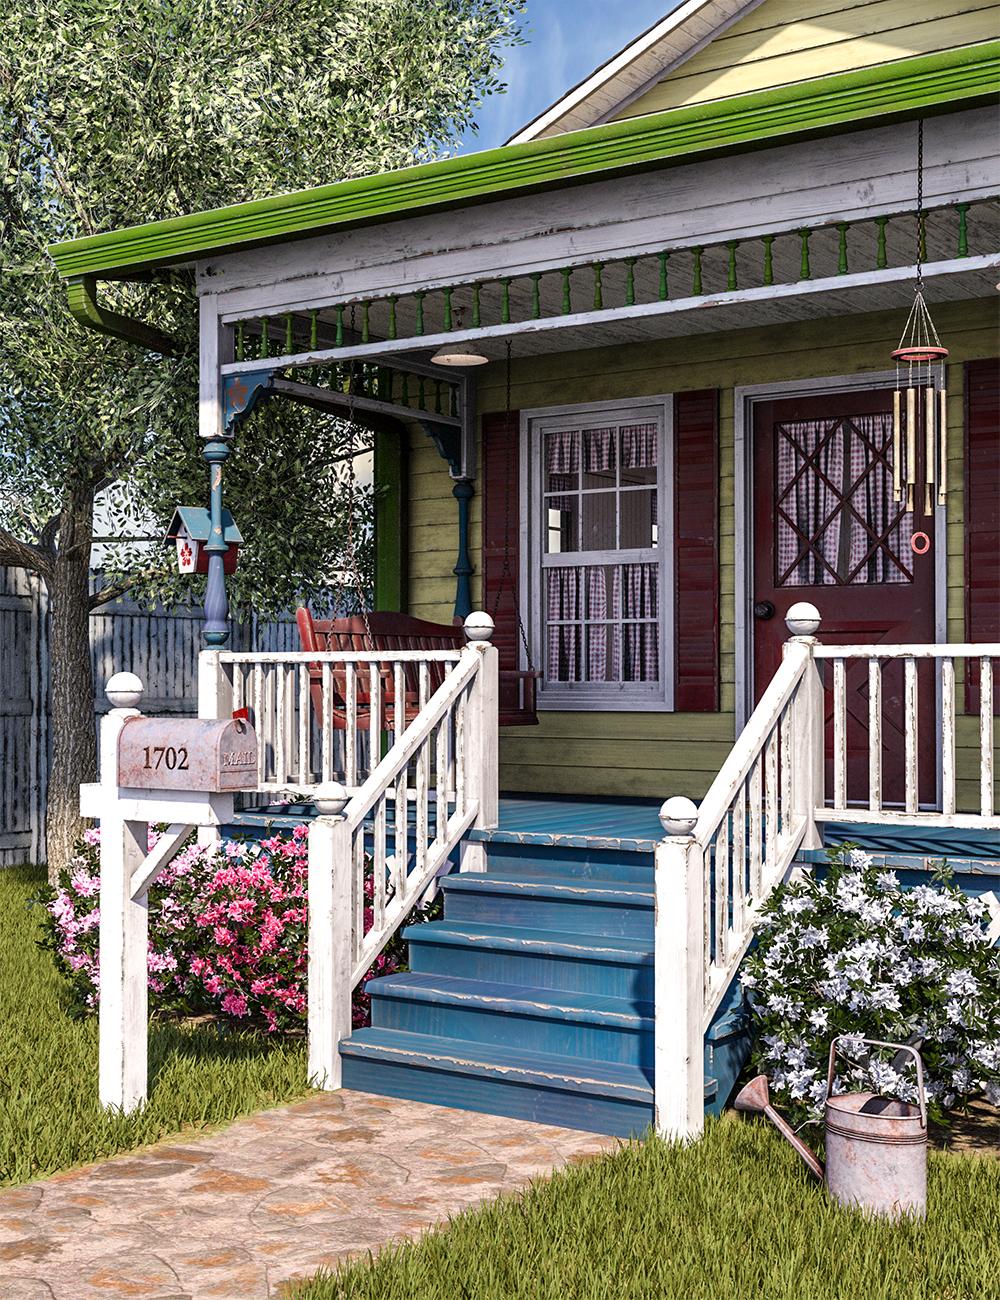 SW Cottage Porch by: SloshWerks, 3D Models by Daz 3D